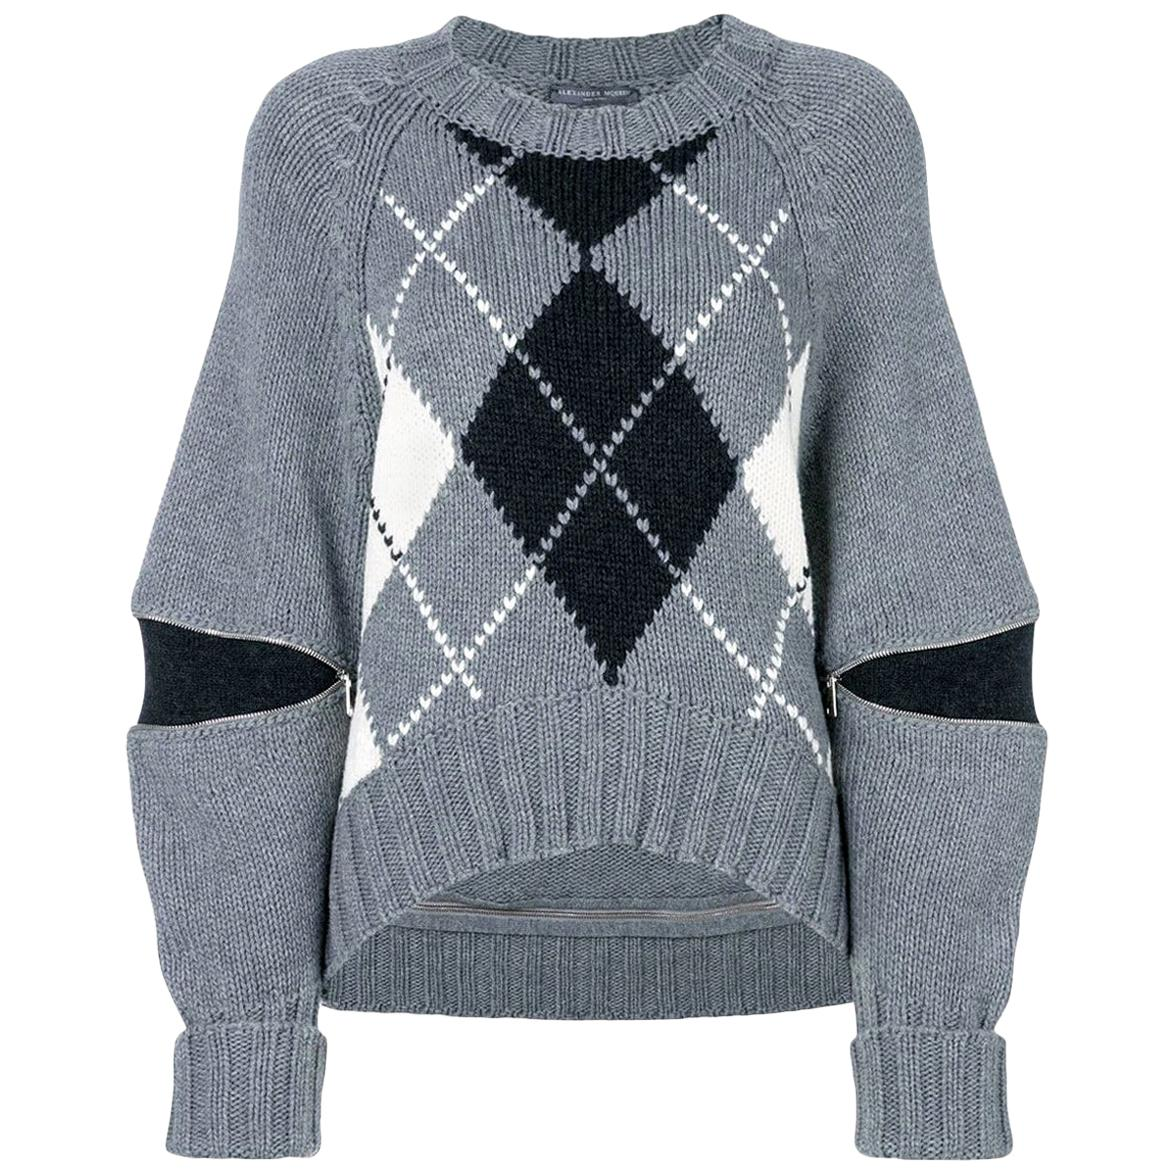 New Laura Dern Big Little Lies Alexander McQueen Argyle Sweater  $1295